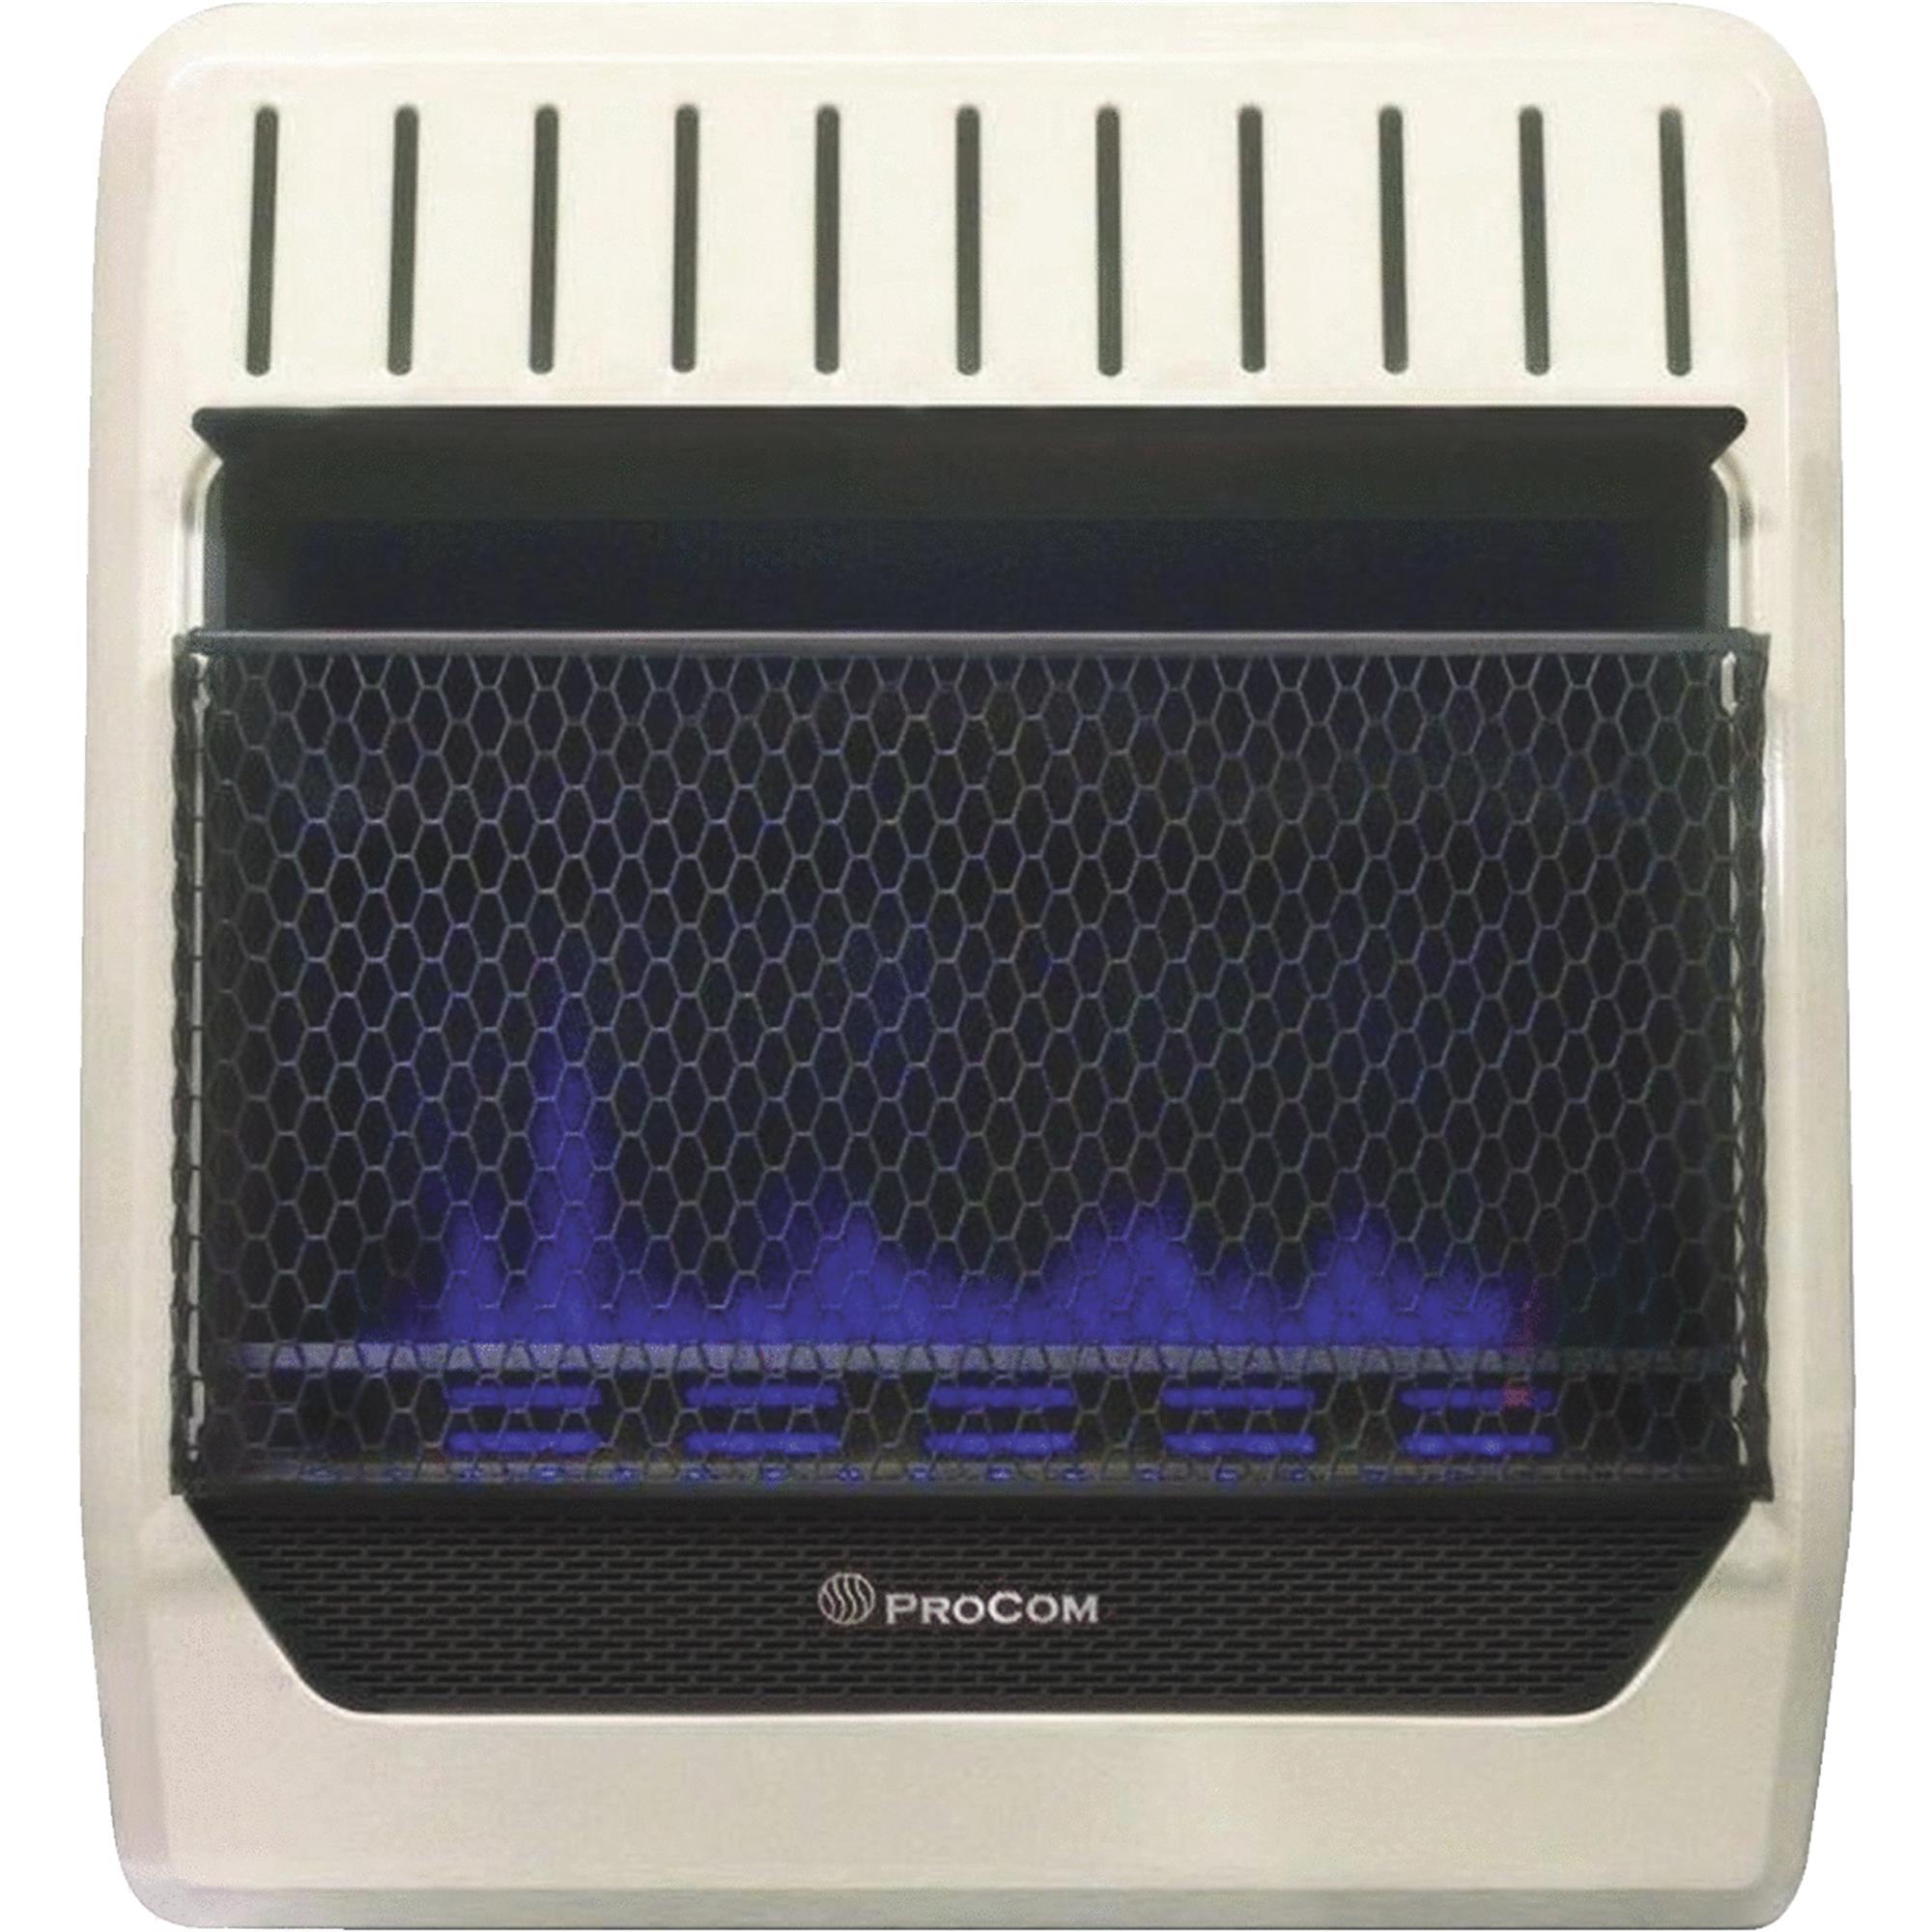 ProCom Dual Fuel Blue Flame Gas Wall Heater